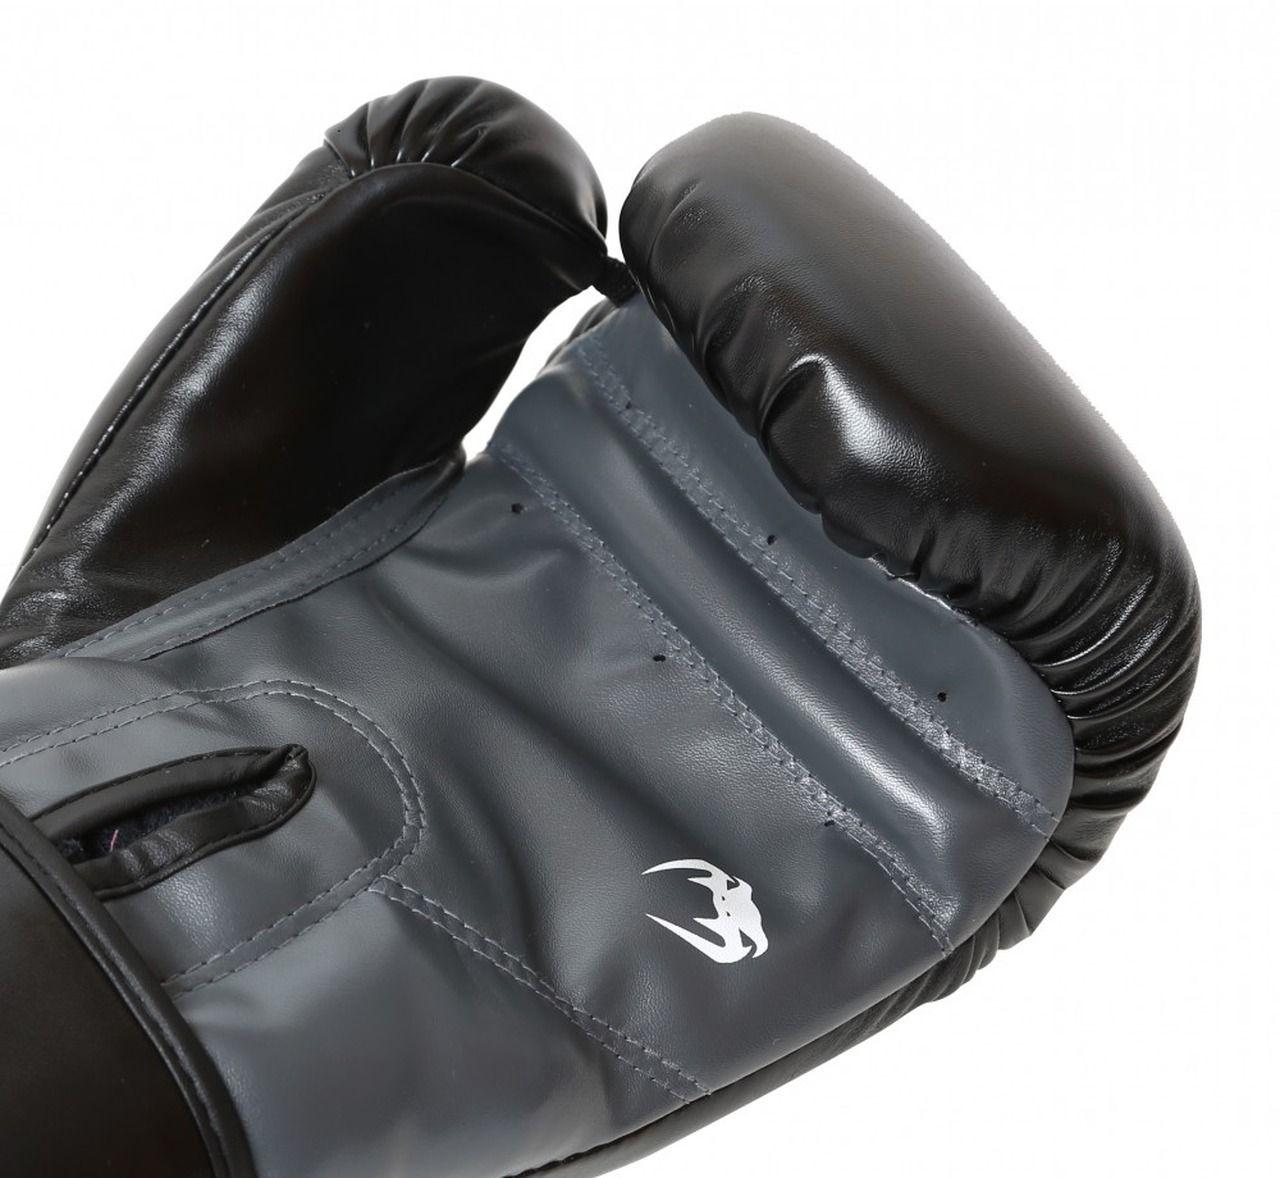 Luva de Boxe / Muay Thai 12oz - Preto - New Contender - Venum  - PRALUTA SHOP